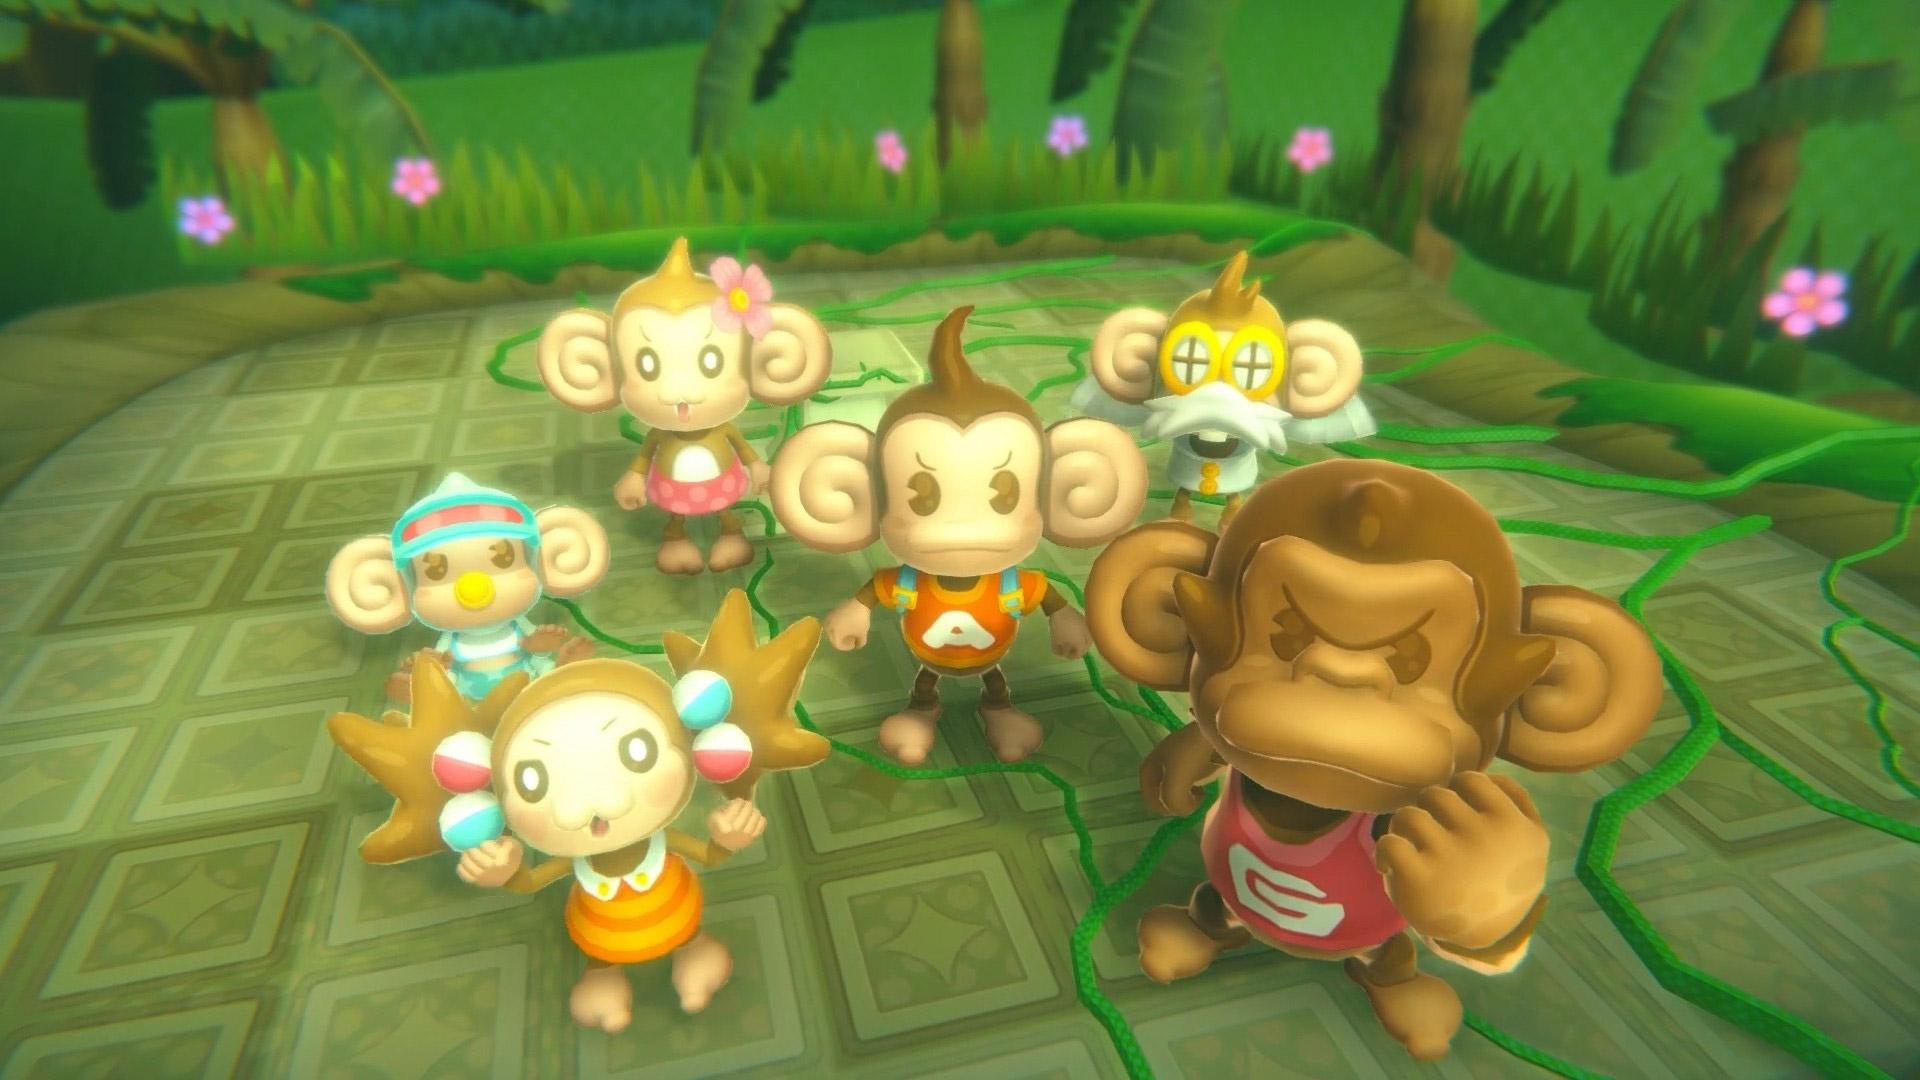 Sega says Banana Blitz HD can open the door for more Super Monkey Ball screenshot